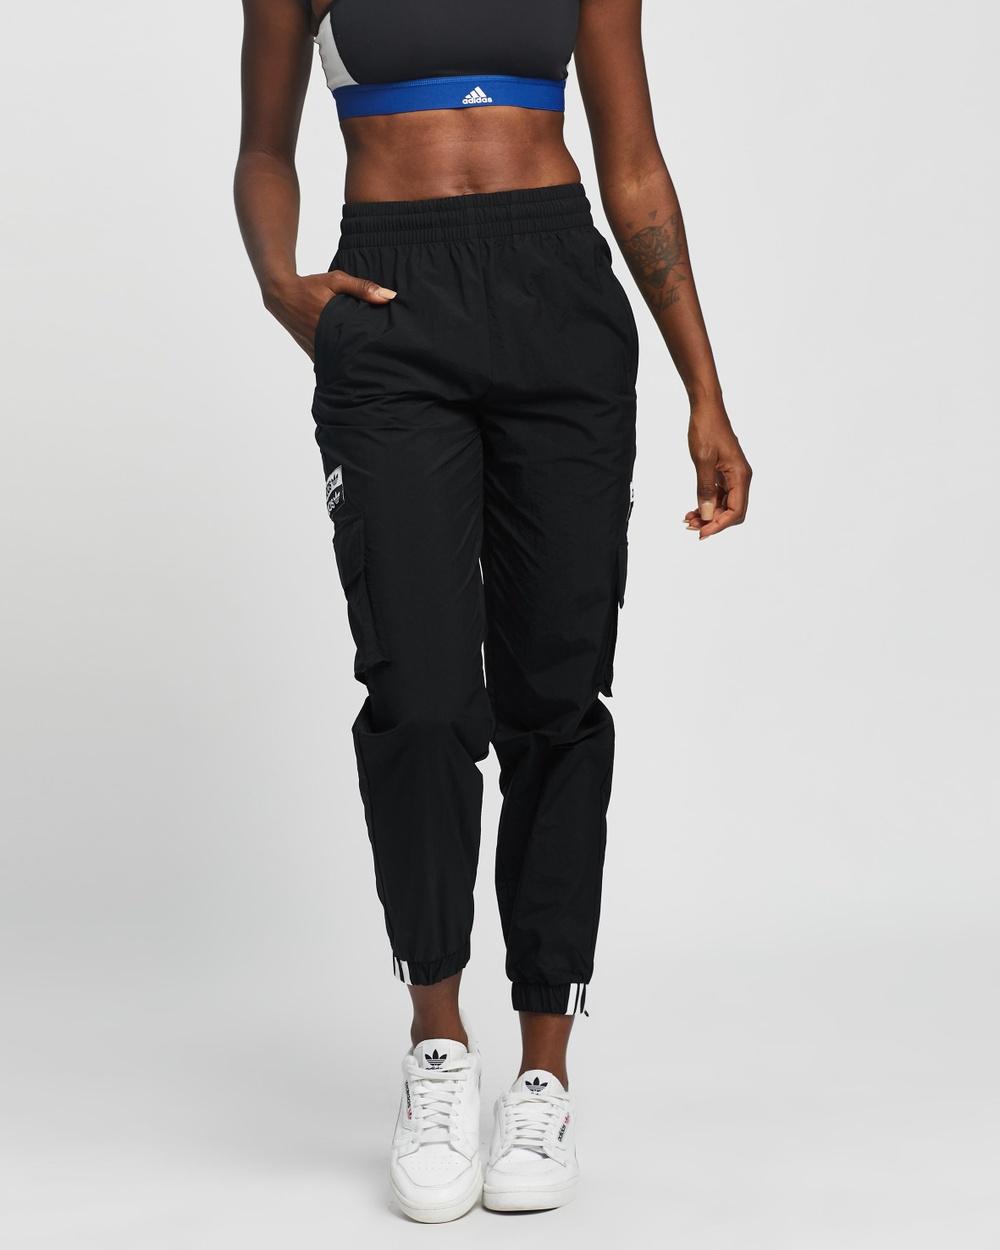 adidas Originals Baloon Cargo Pants Black